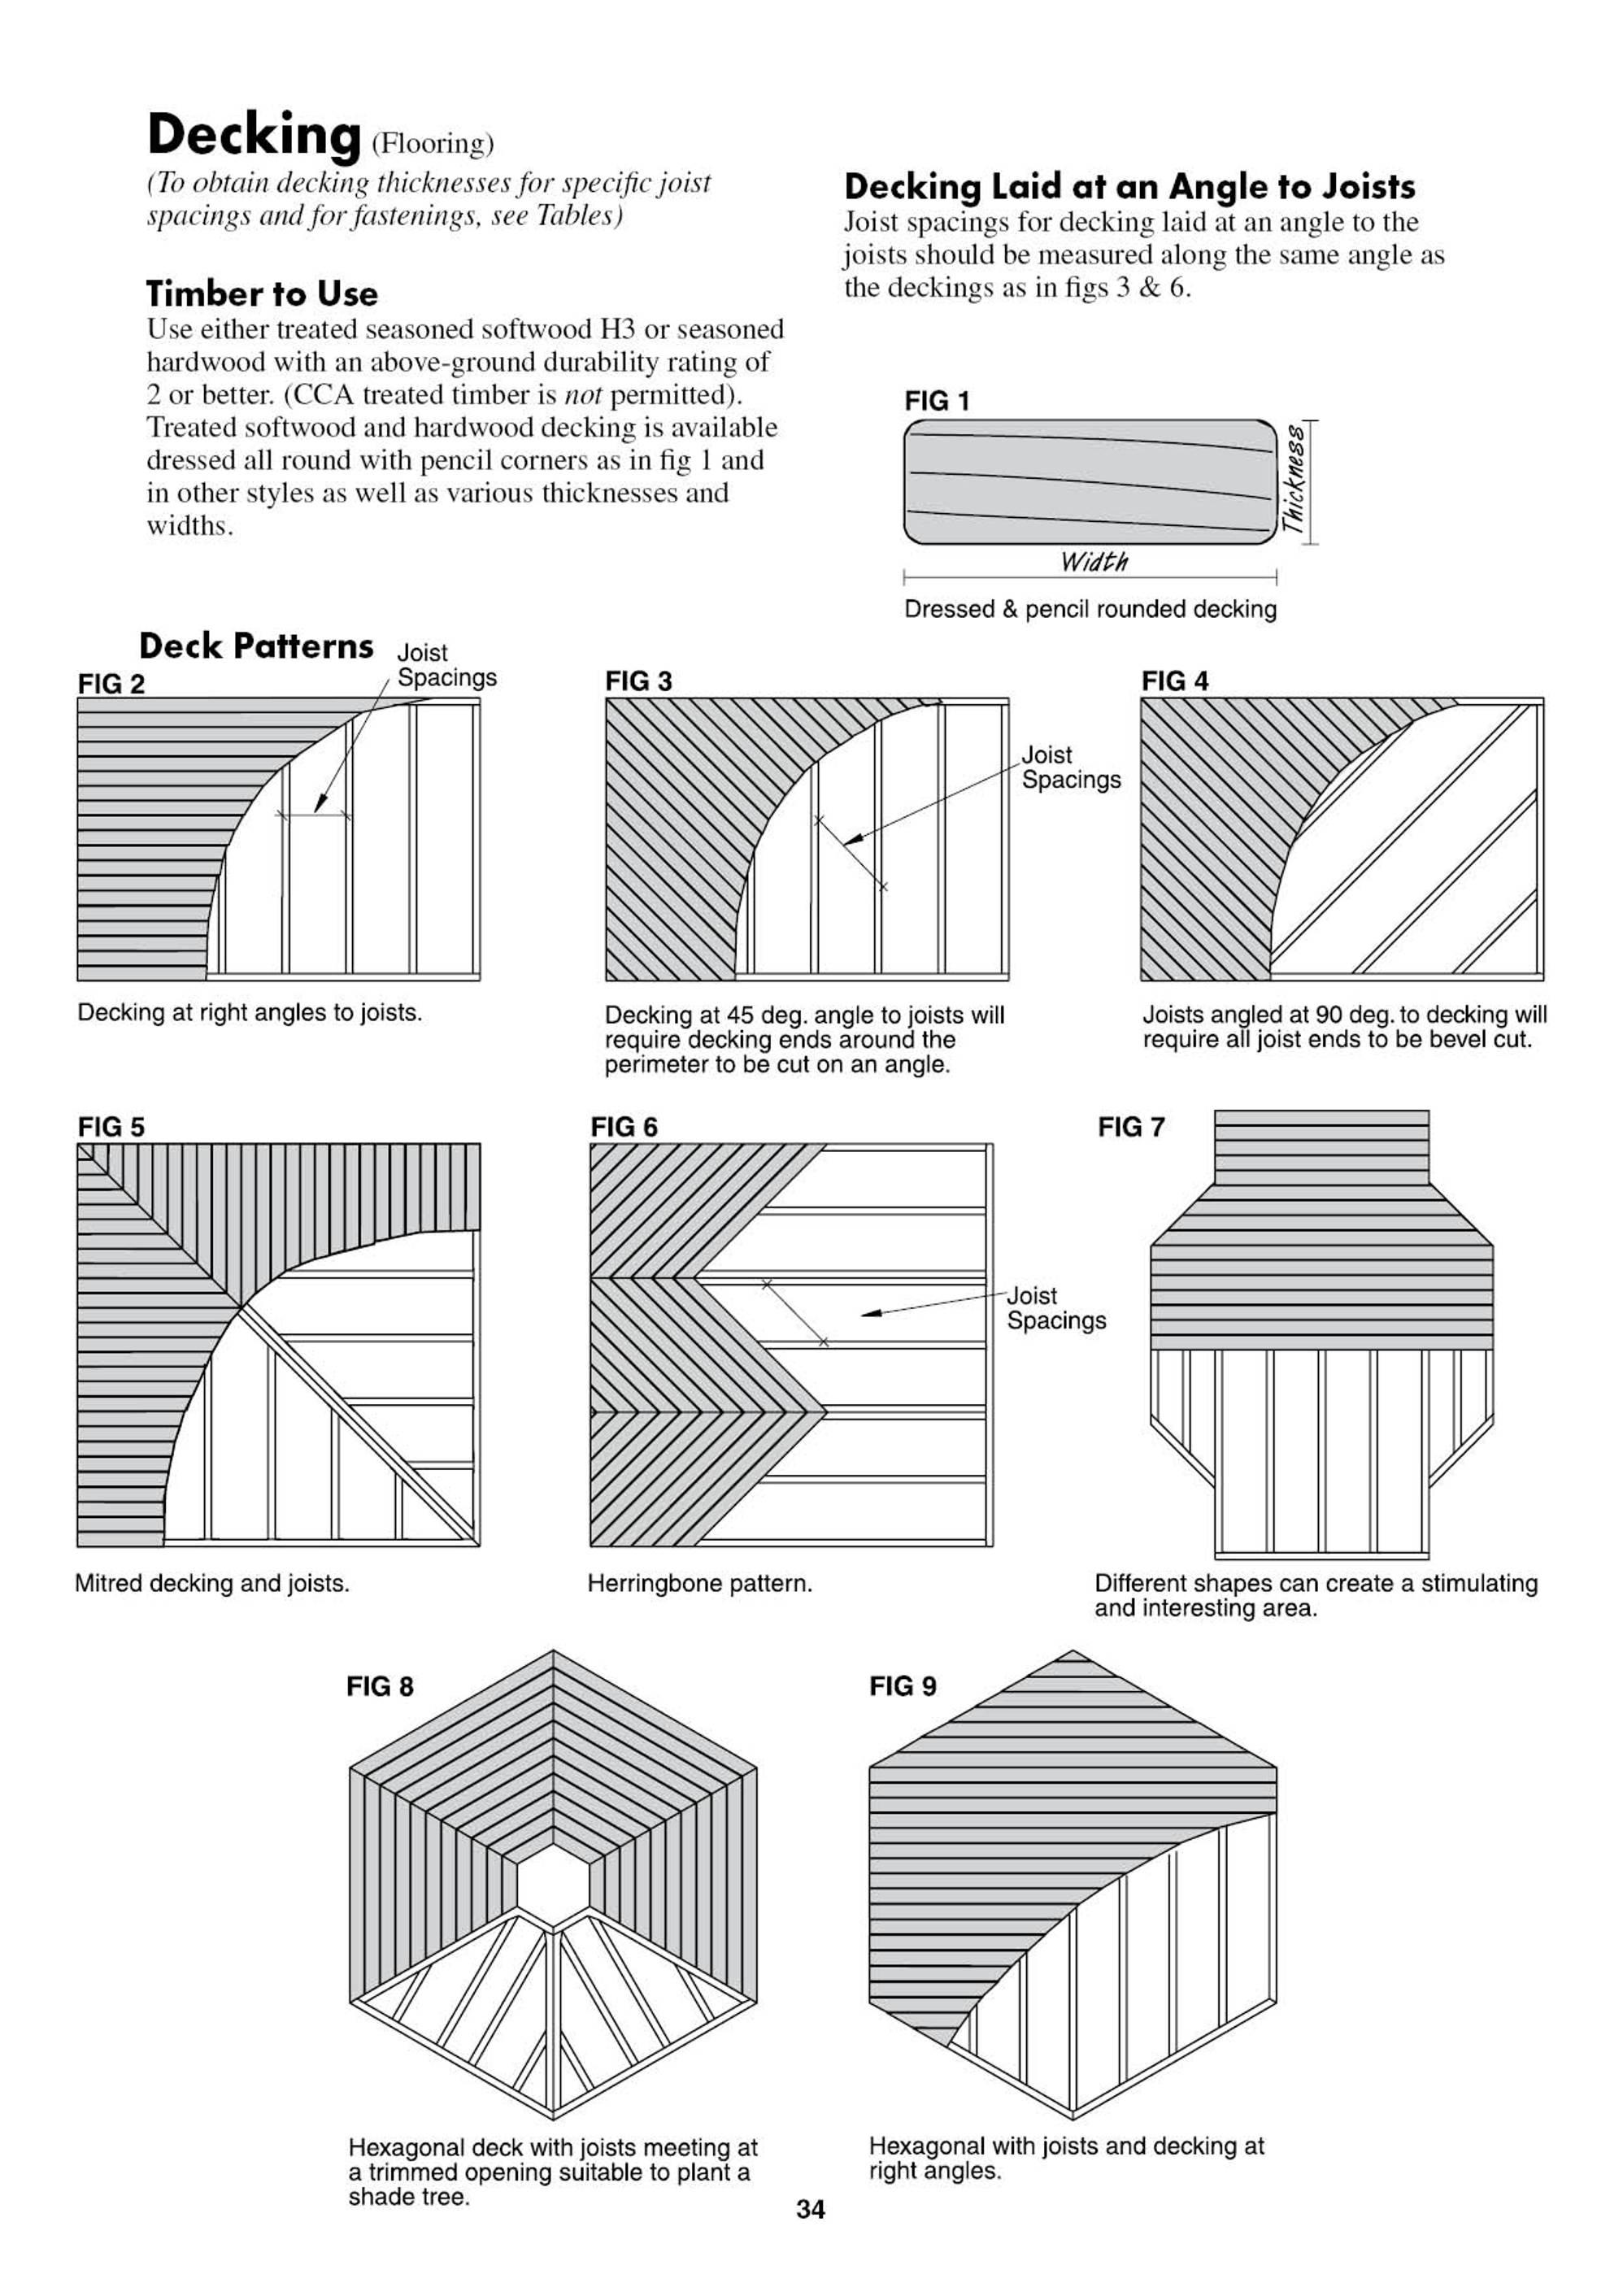 Australian decks pergolas construction manual allan staines australian decks pergolas construction manual allan staines 7th edition solutioingenieria Gallery